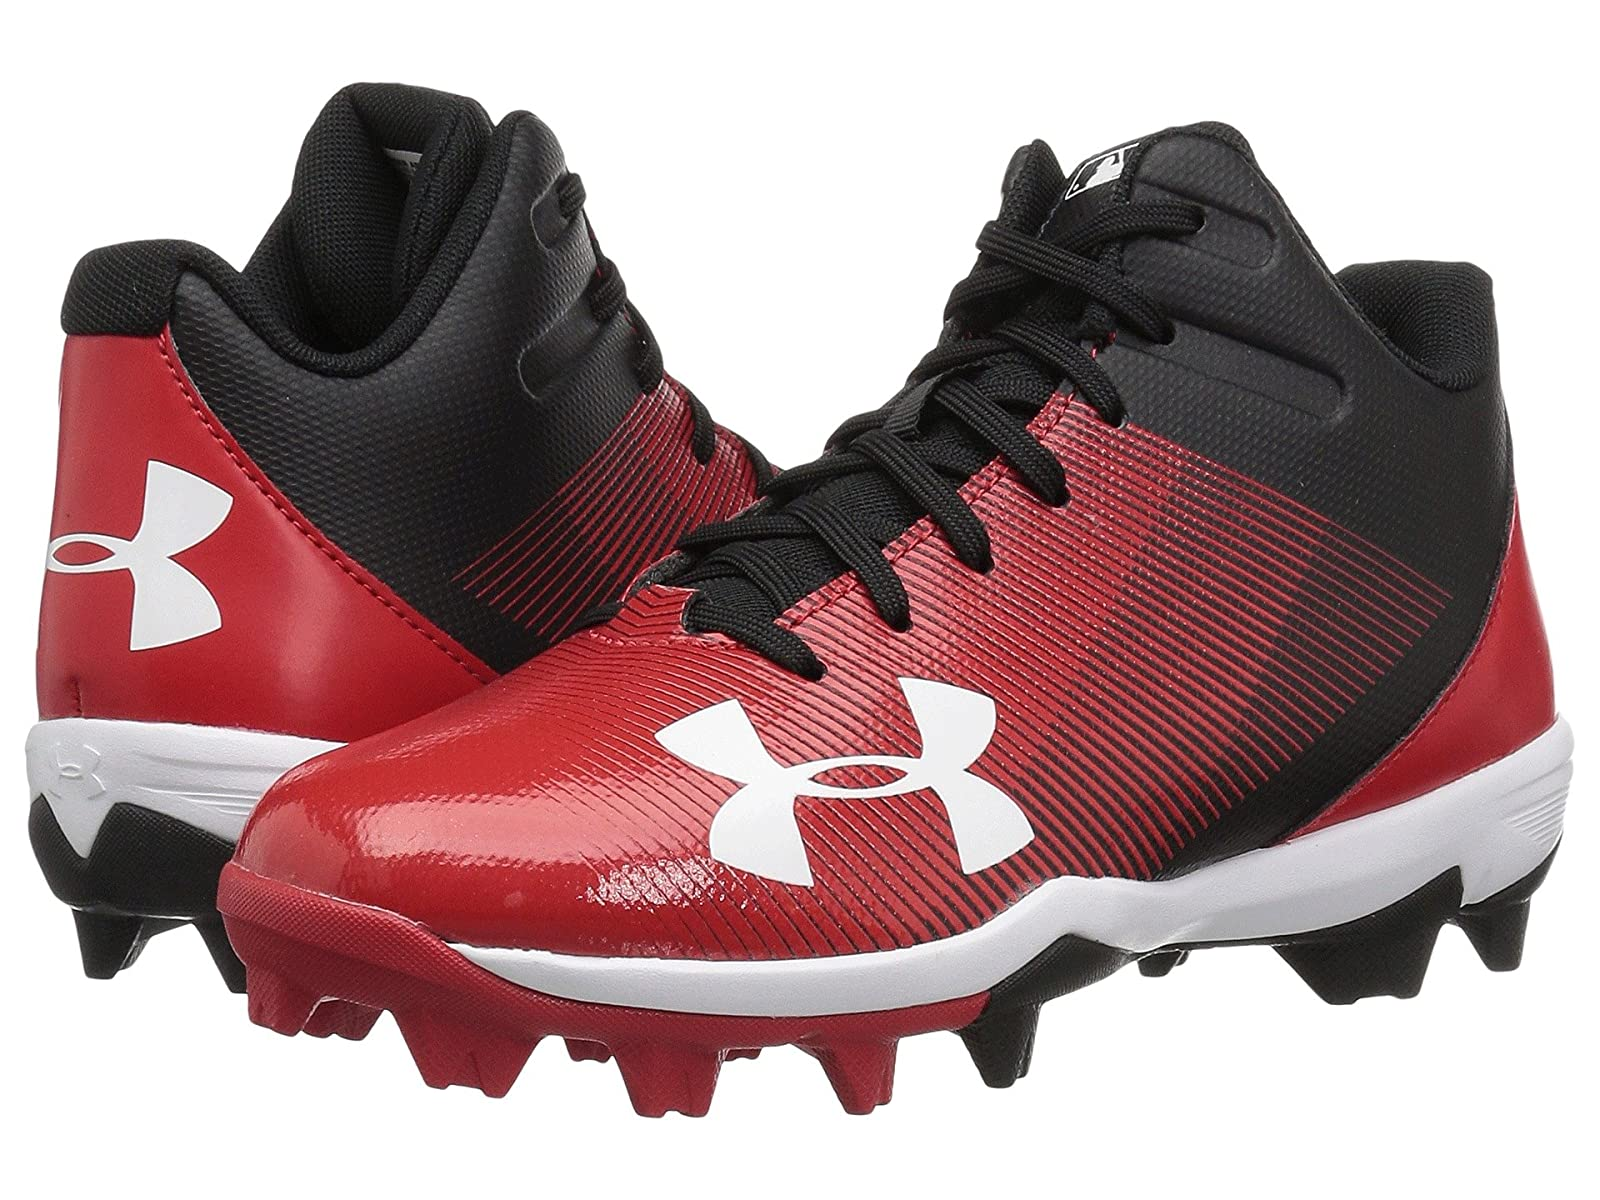 Under Armour Kids Leadoff Mid RM Jr. Baseball (Toddler/Little Kid/Big Kid)Atmospheric grades have affordable shoes